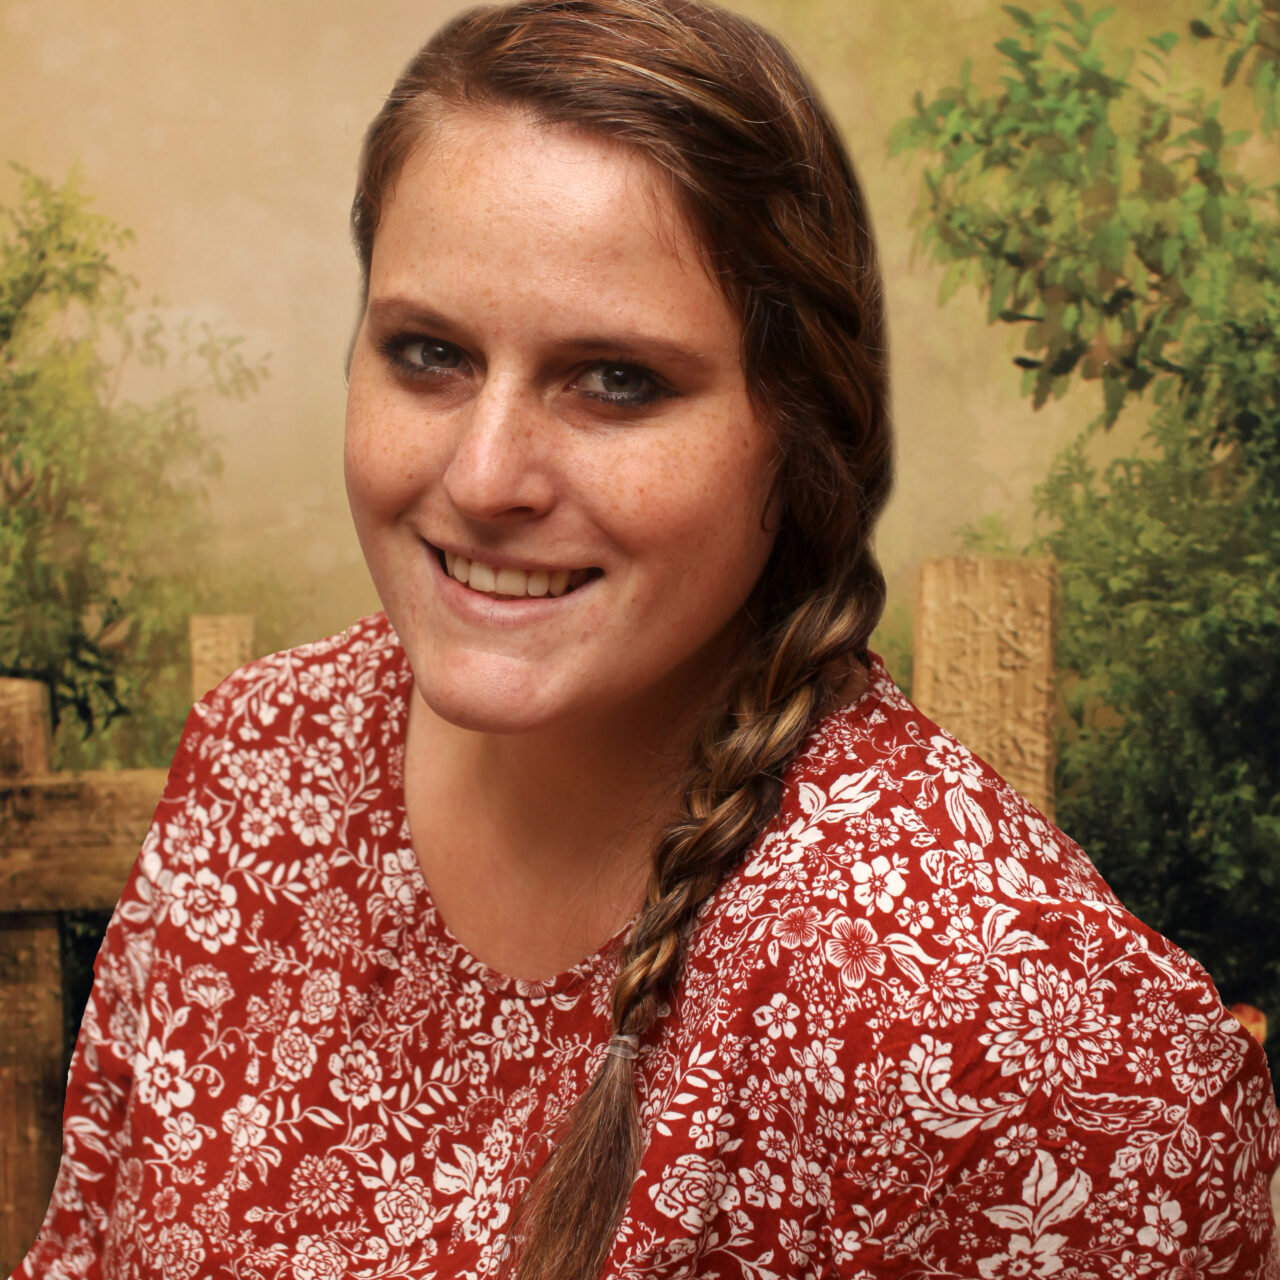 marieta boucher tutor boksburg